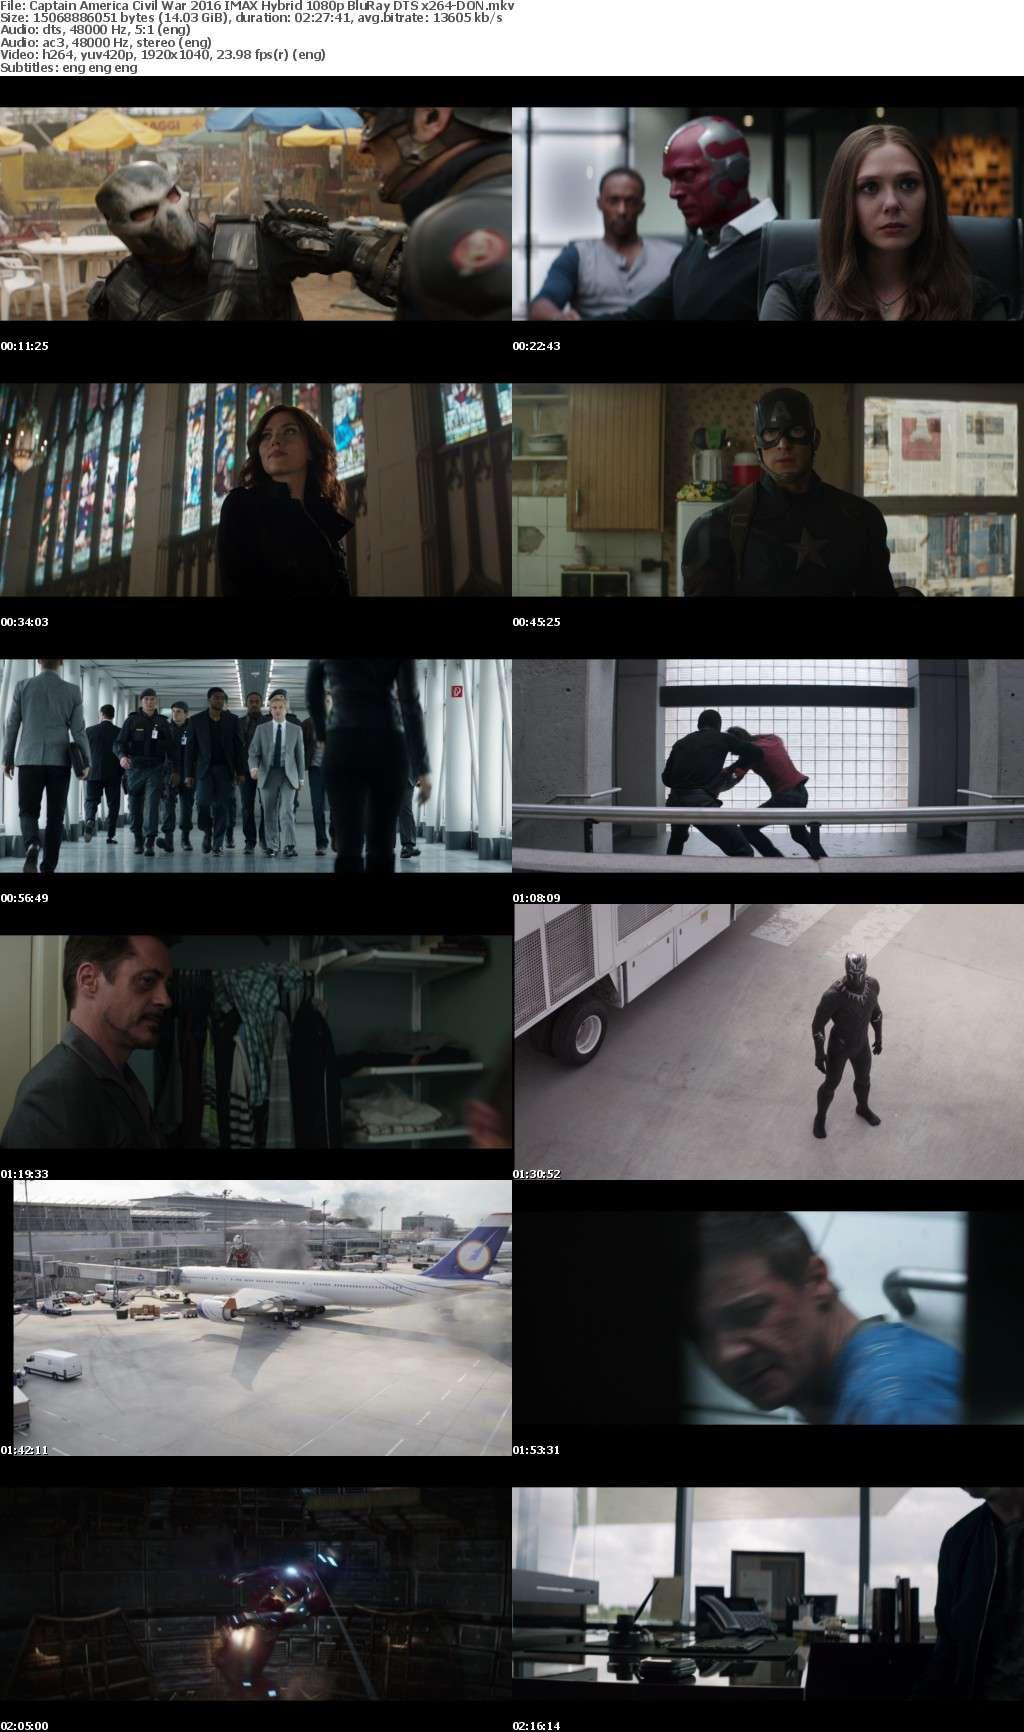 Captain America Civil War 2016 IMAX Hybrid 1080p BluRay DTS x264-DON